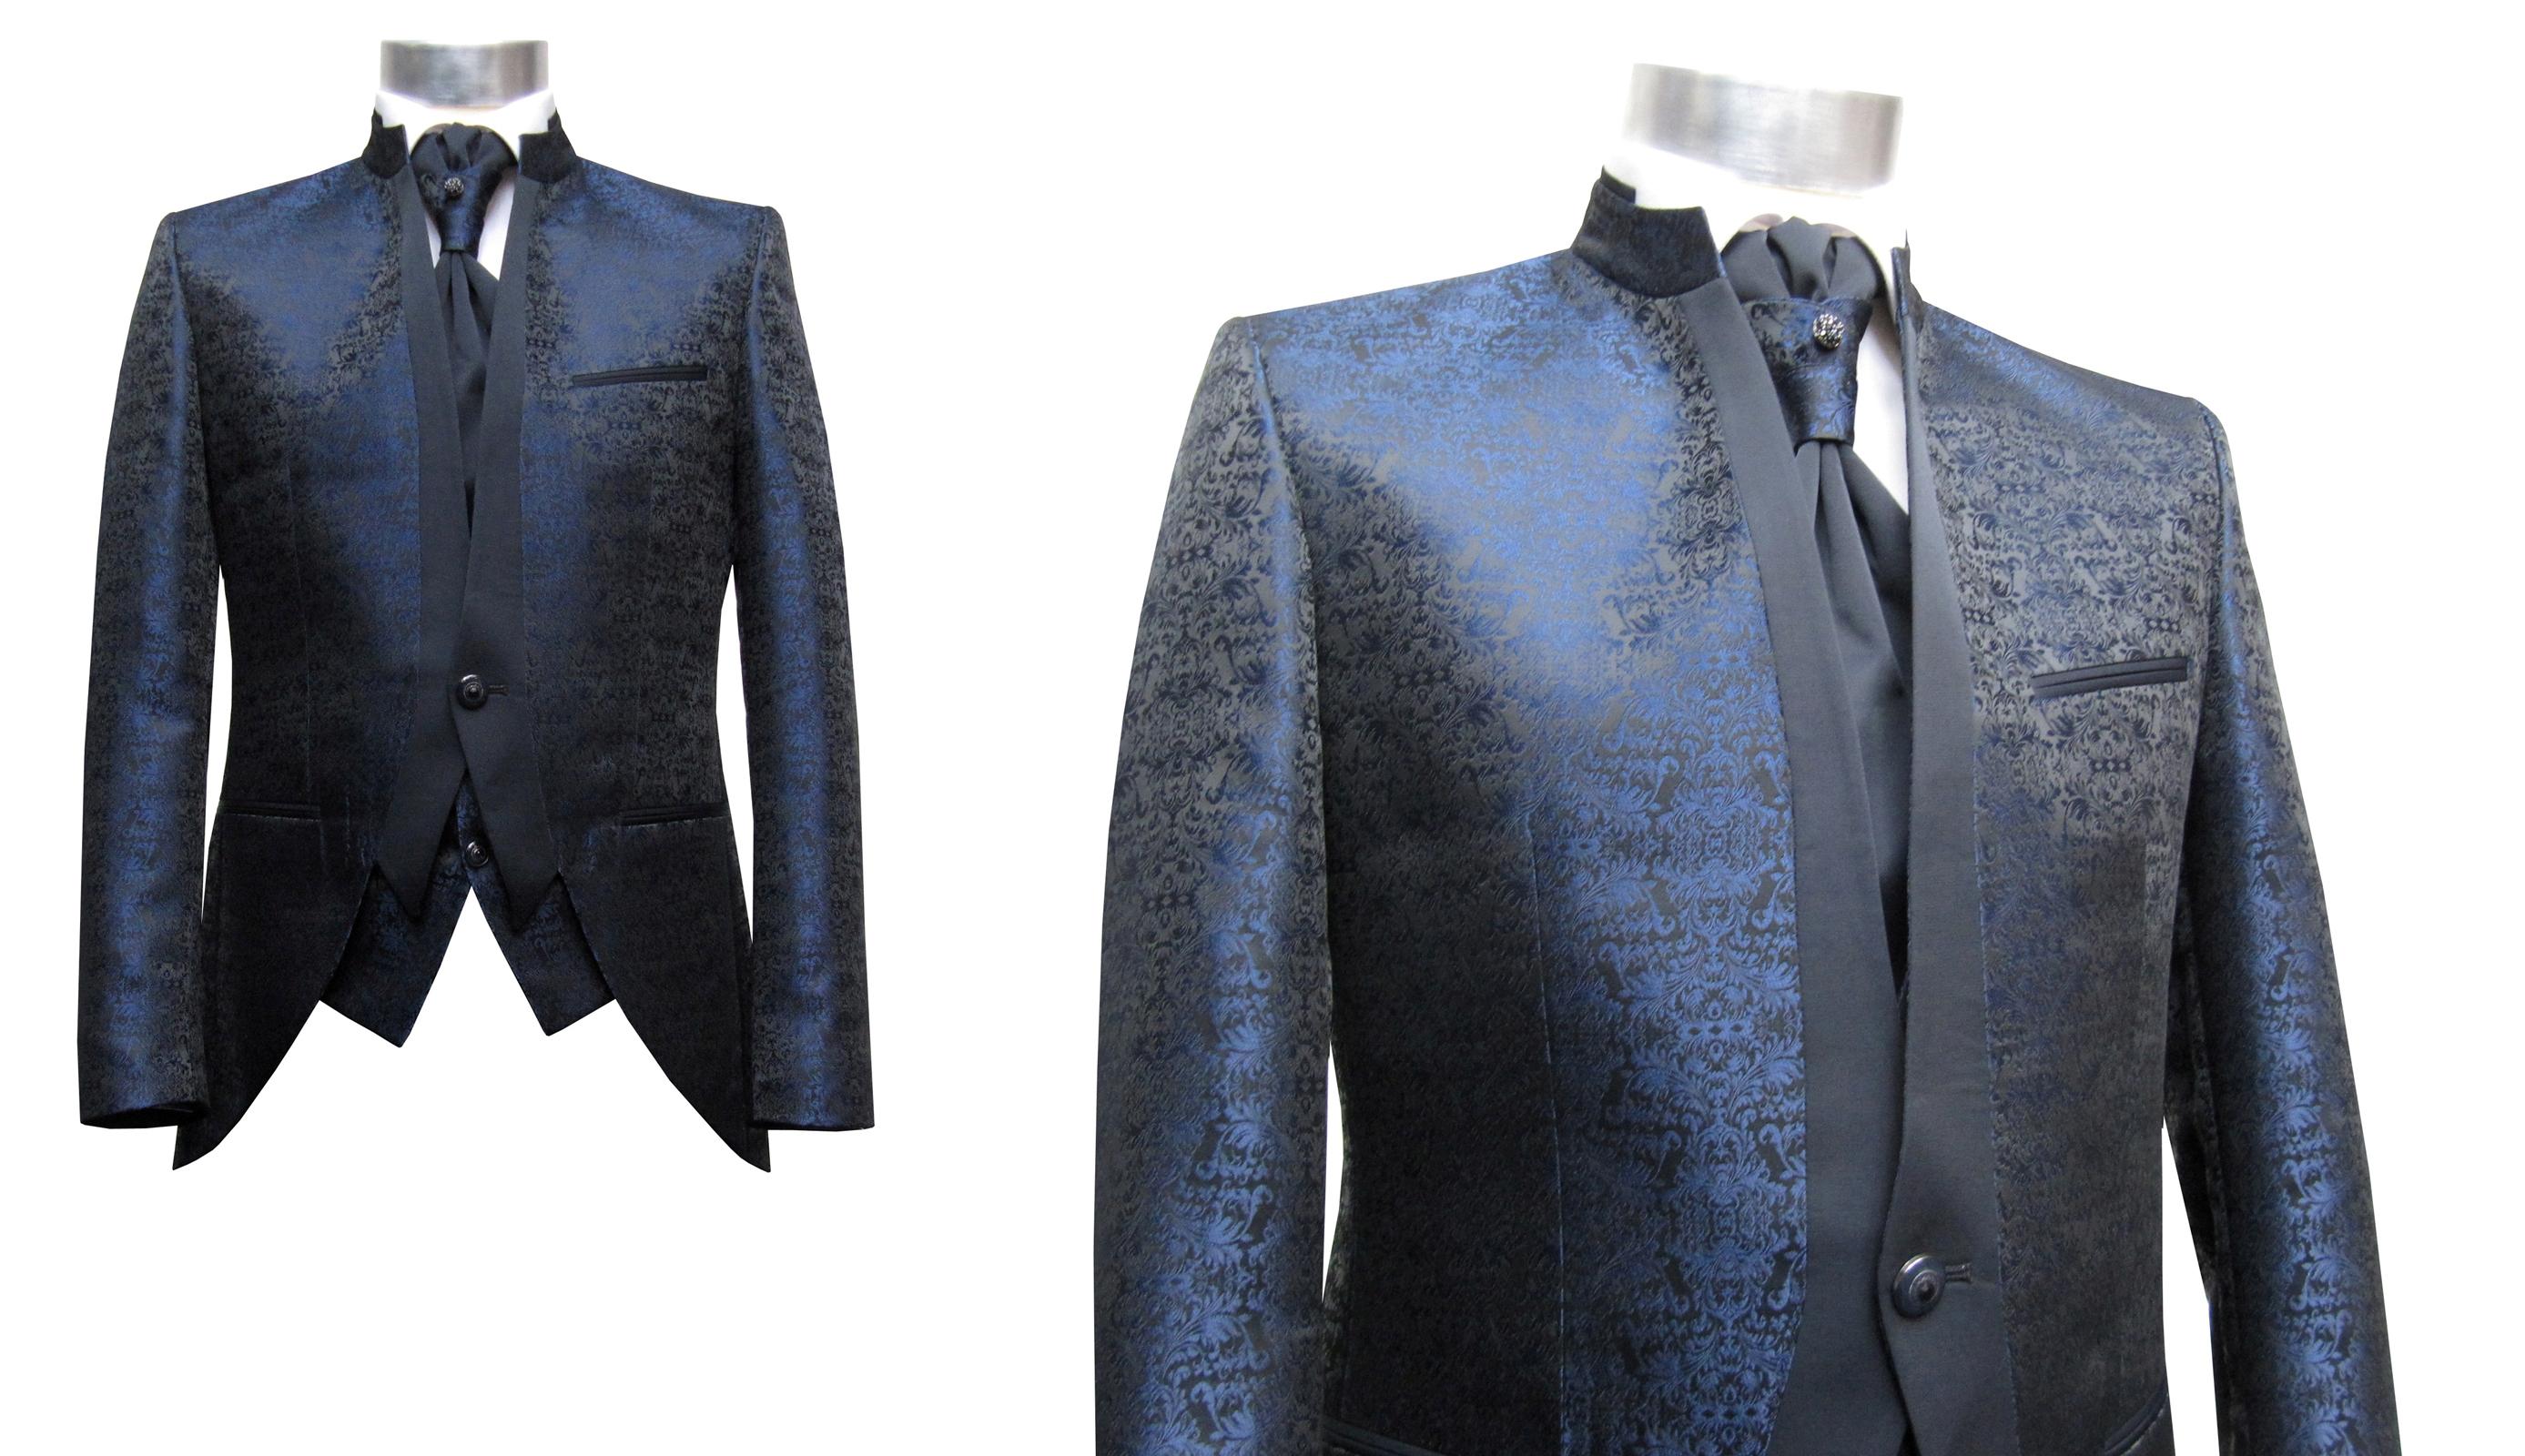 elegante mao kragen herren anzug 4 teilig dunkelblau. Black Bedroom Furniture Sets. Home Design Ideas